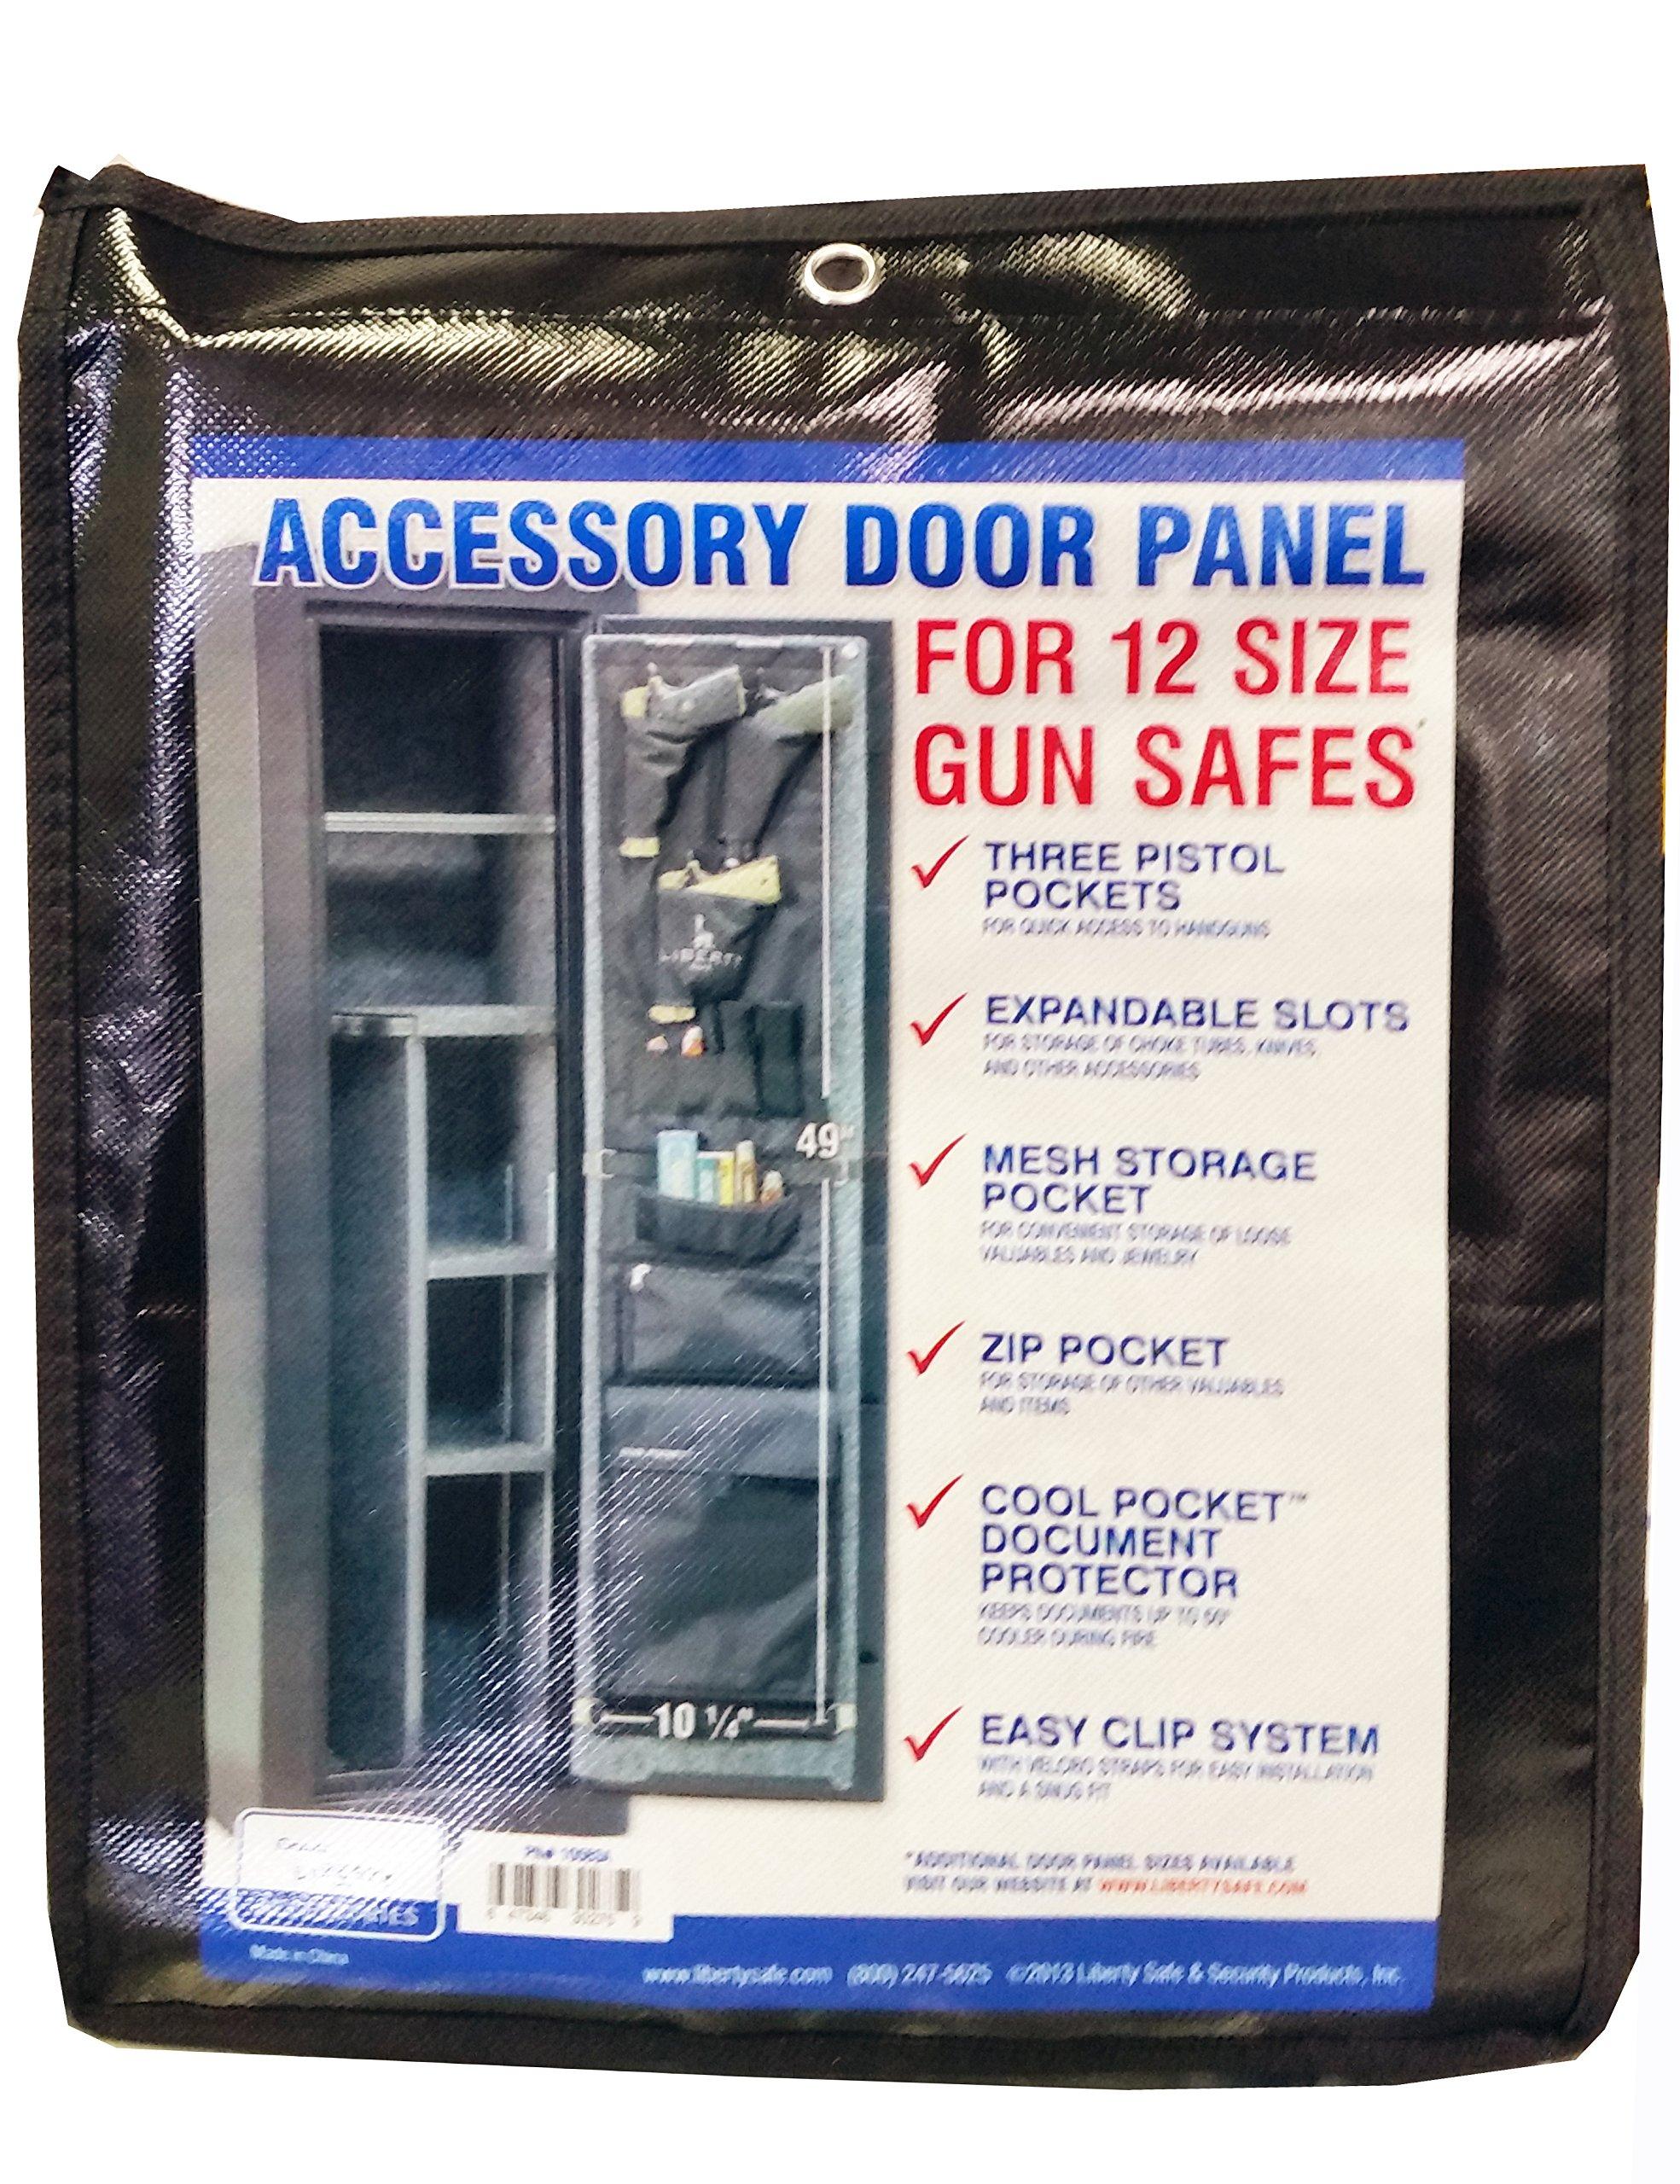 Liberty Safe Door Panel for EXTERNAL HINGE 12 Size Gun Safes Fits USA Made Centurion 12 by Liberty Safe